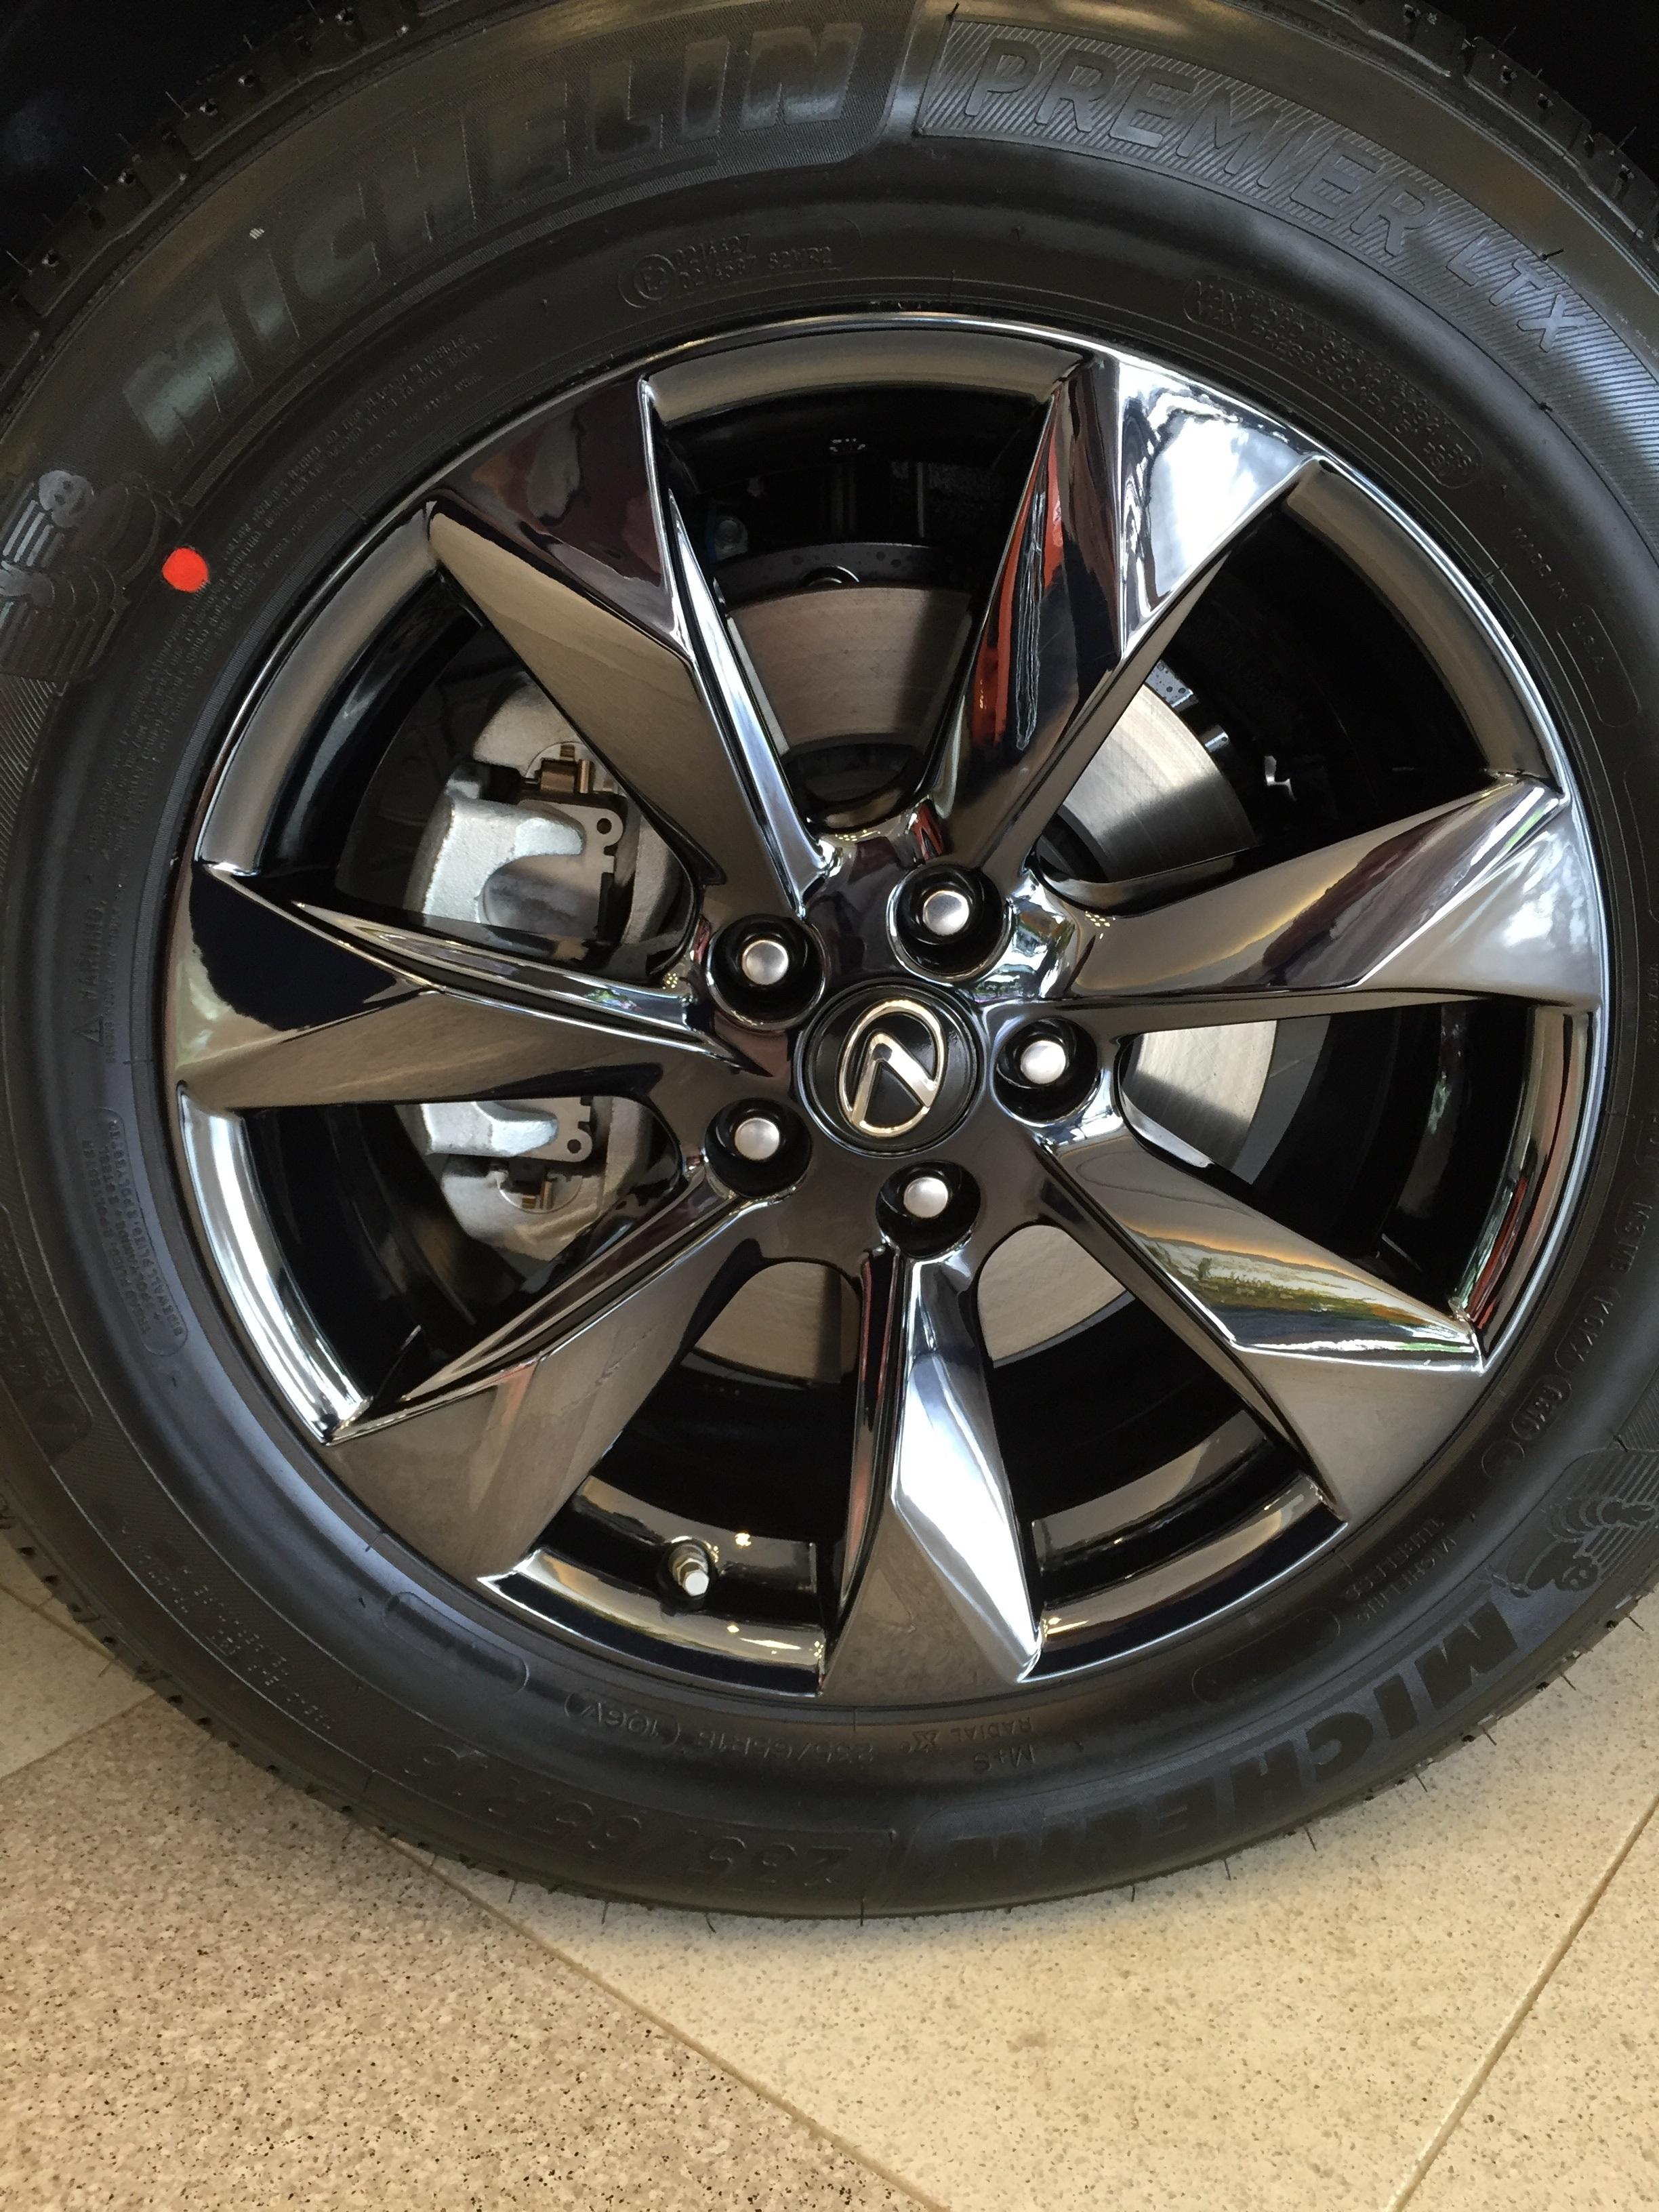 black-rx350-18in-mishawaka-2-wheel-close-up_25350366299_o.jpg